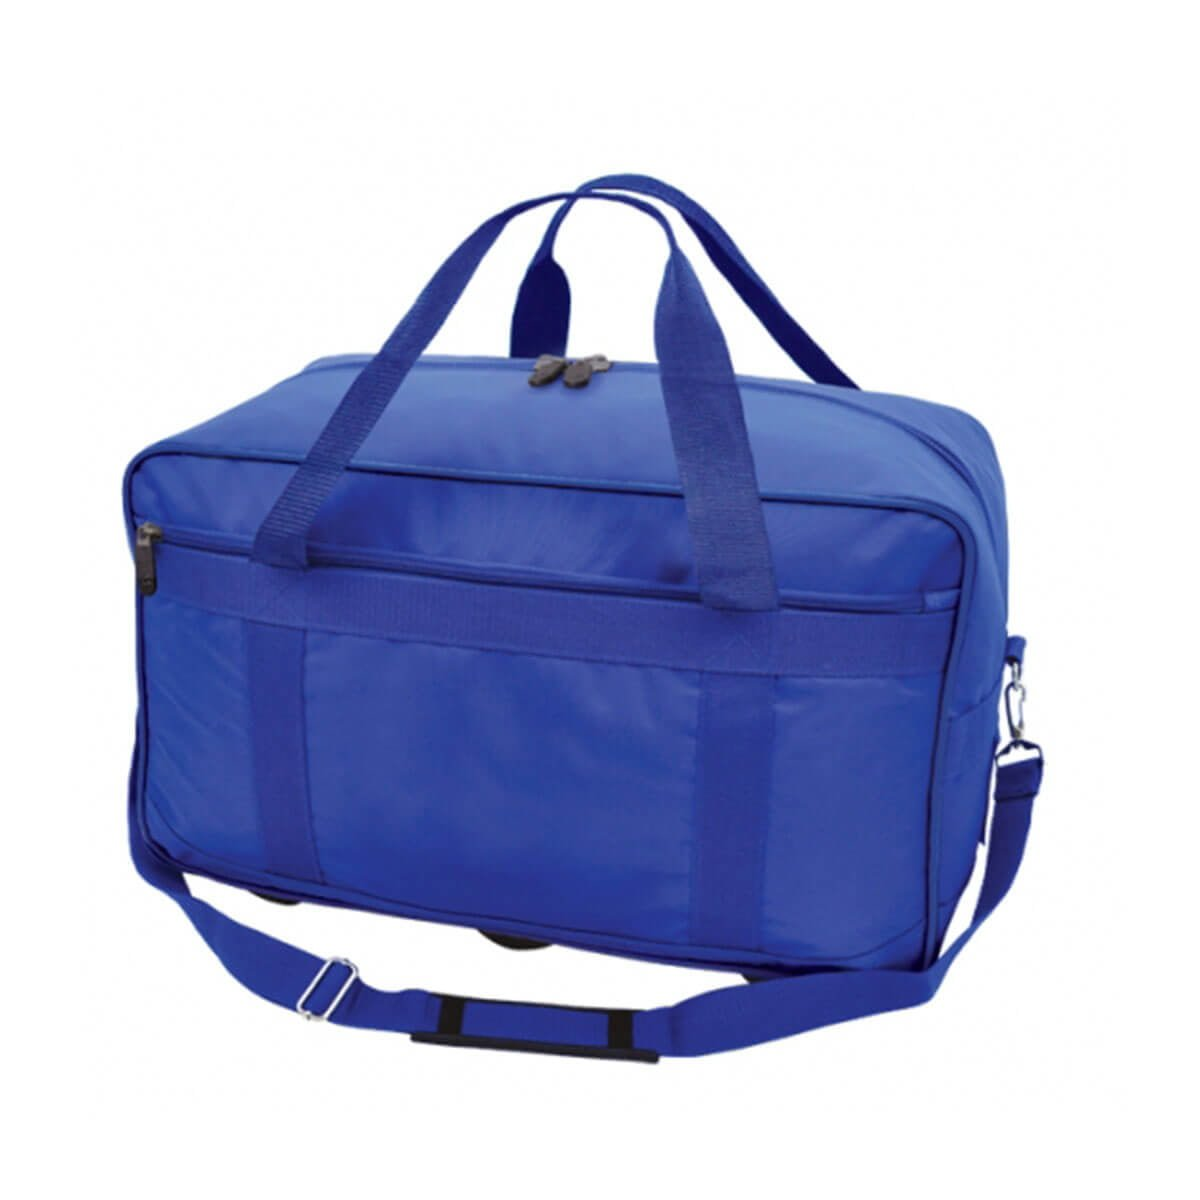 Estelle Sports Bag-Royal